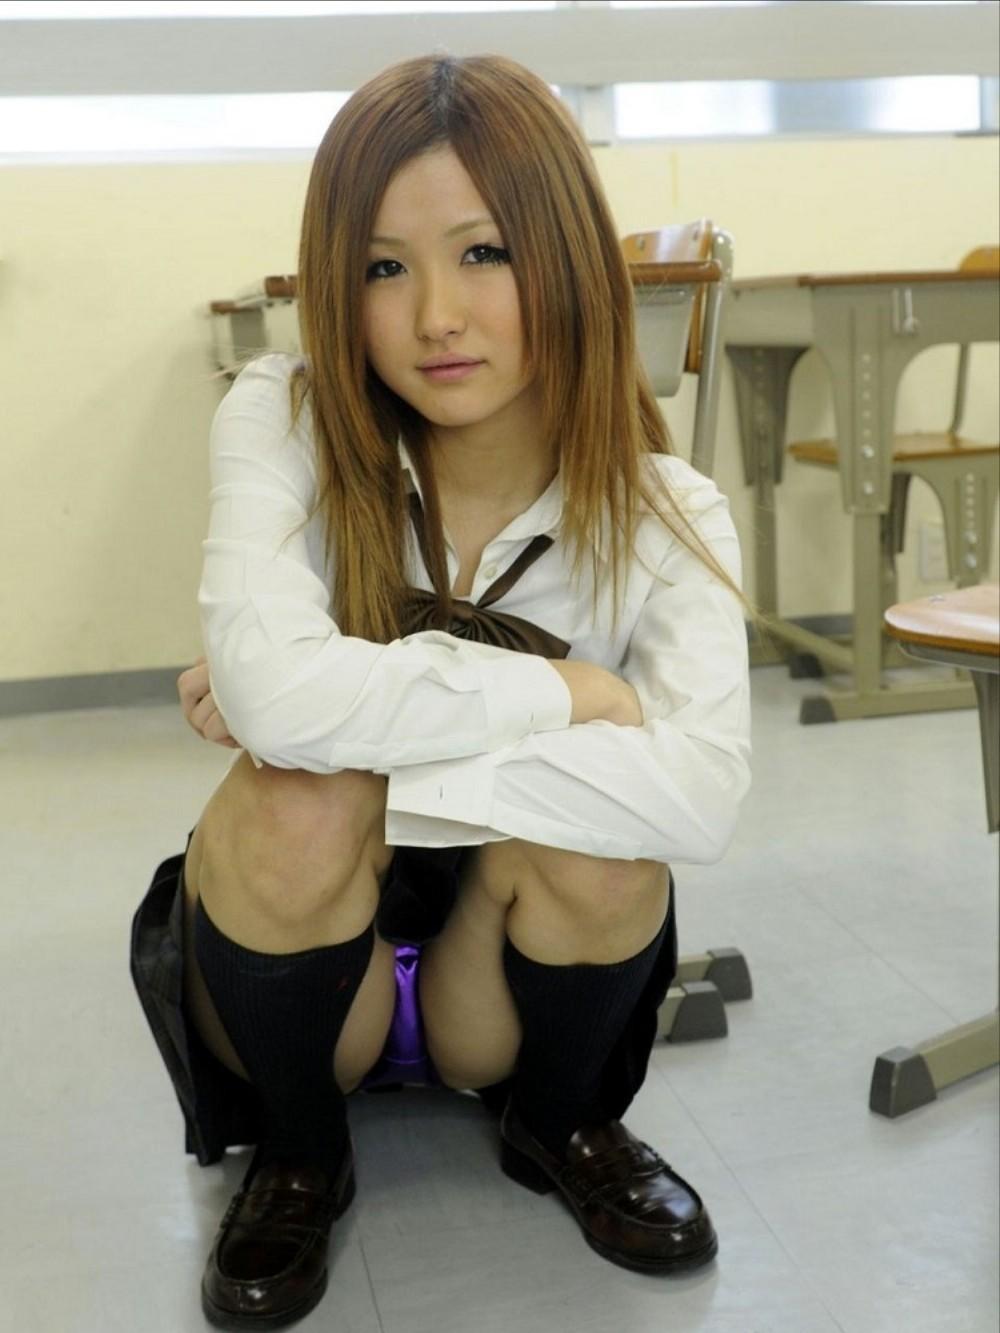 JKパンチラ!女子高生の制服姿のエロ画像32枚・2枚目の画像